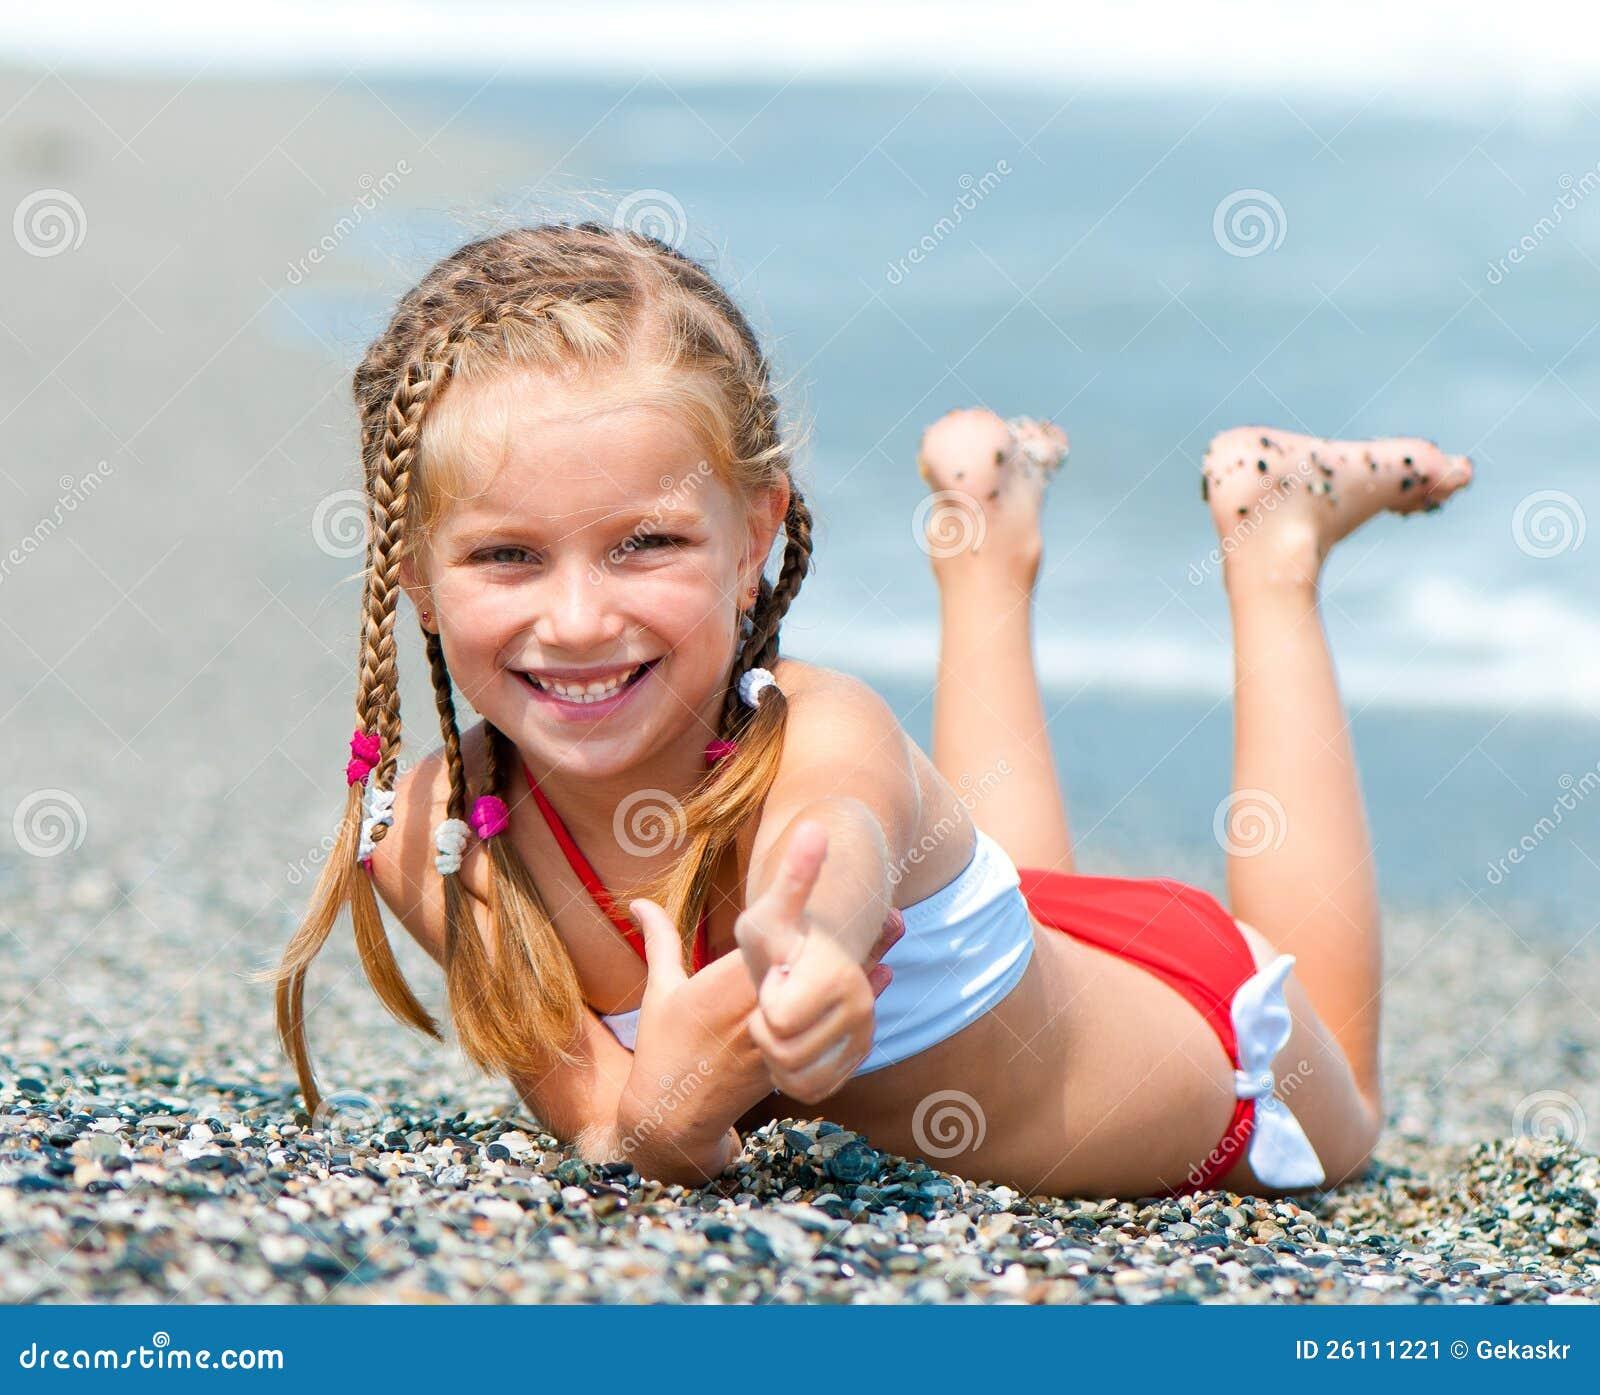 Beautiful Woman Face Over Beach Sunset Stock Image: Face Of The Beautiful Girl On A Beach Stock Image